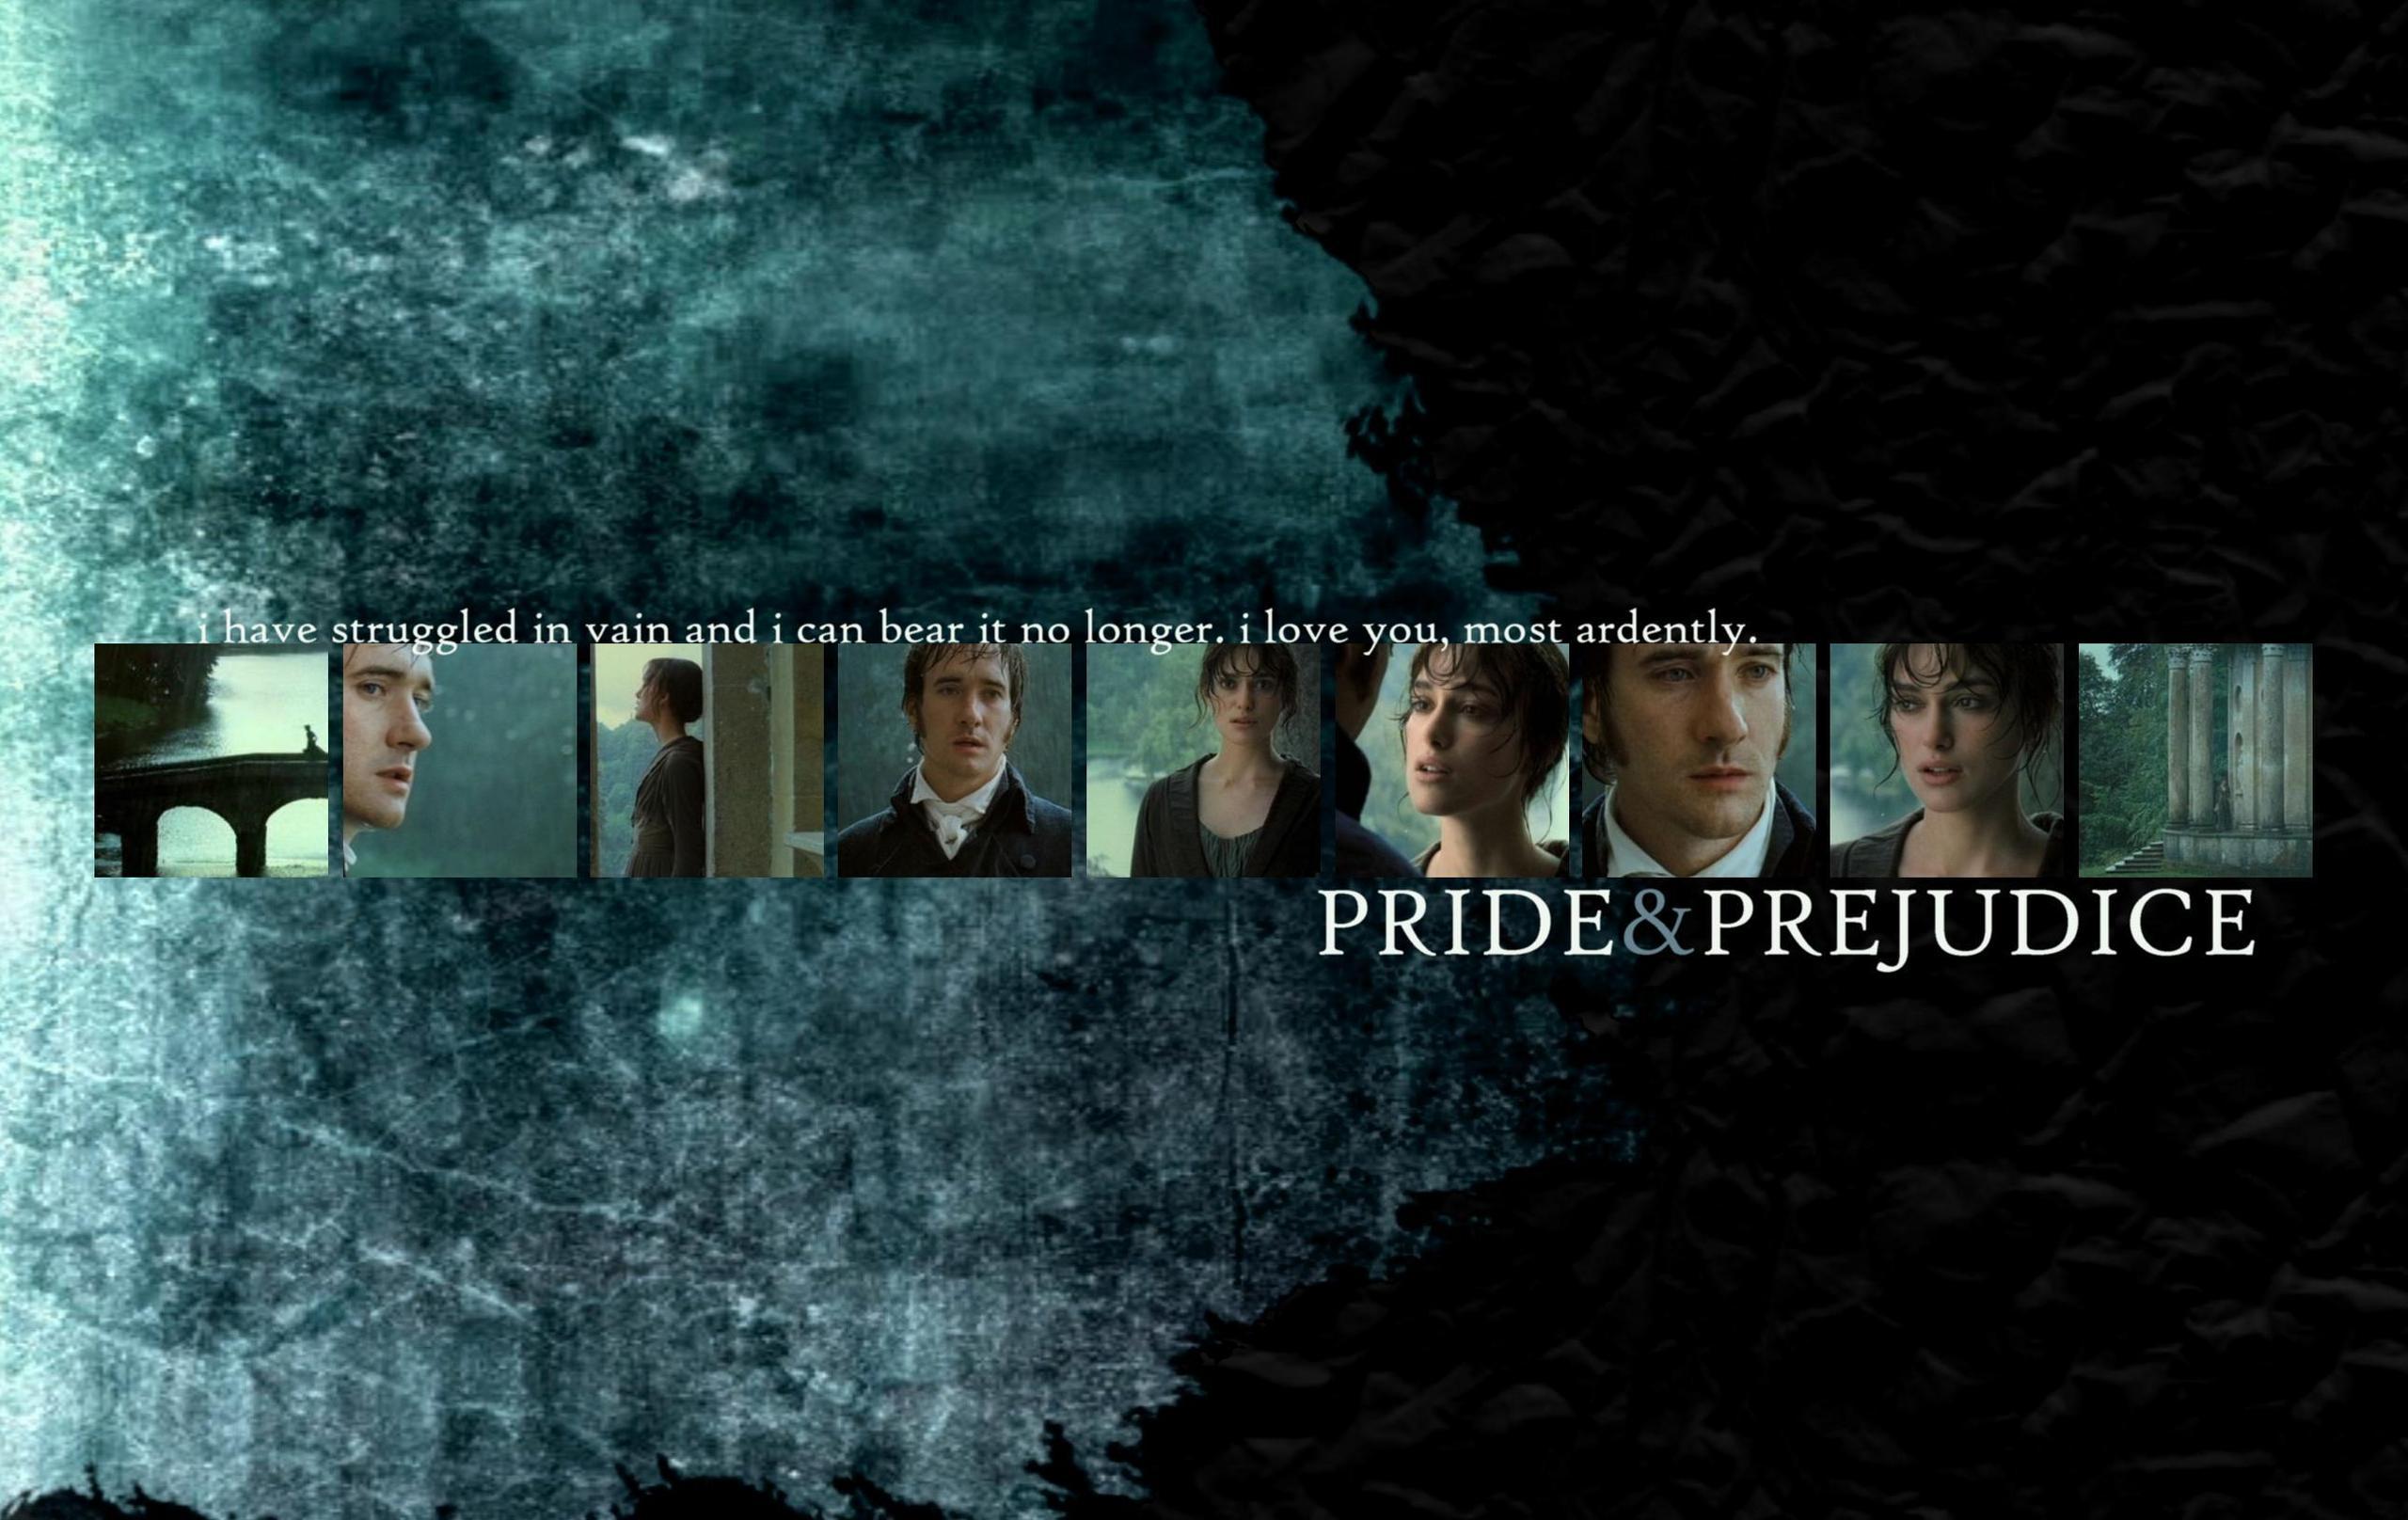 pride and prejudice proposal